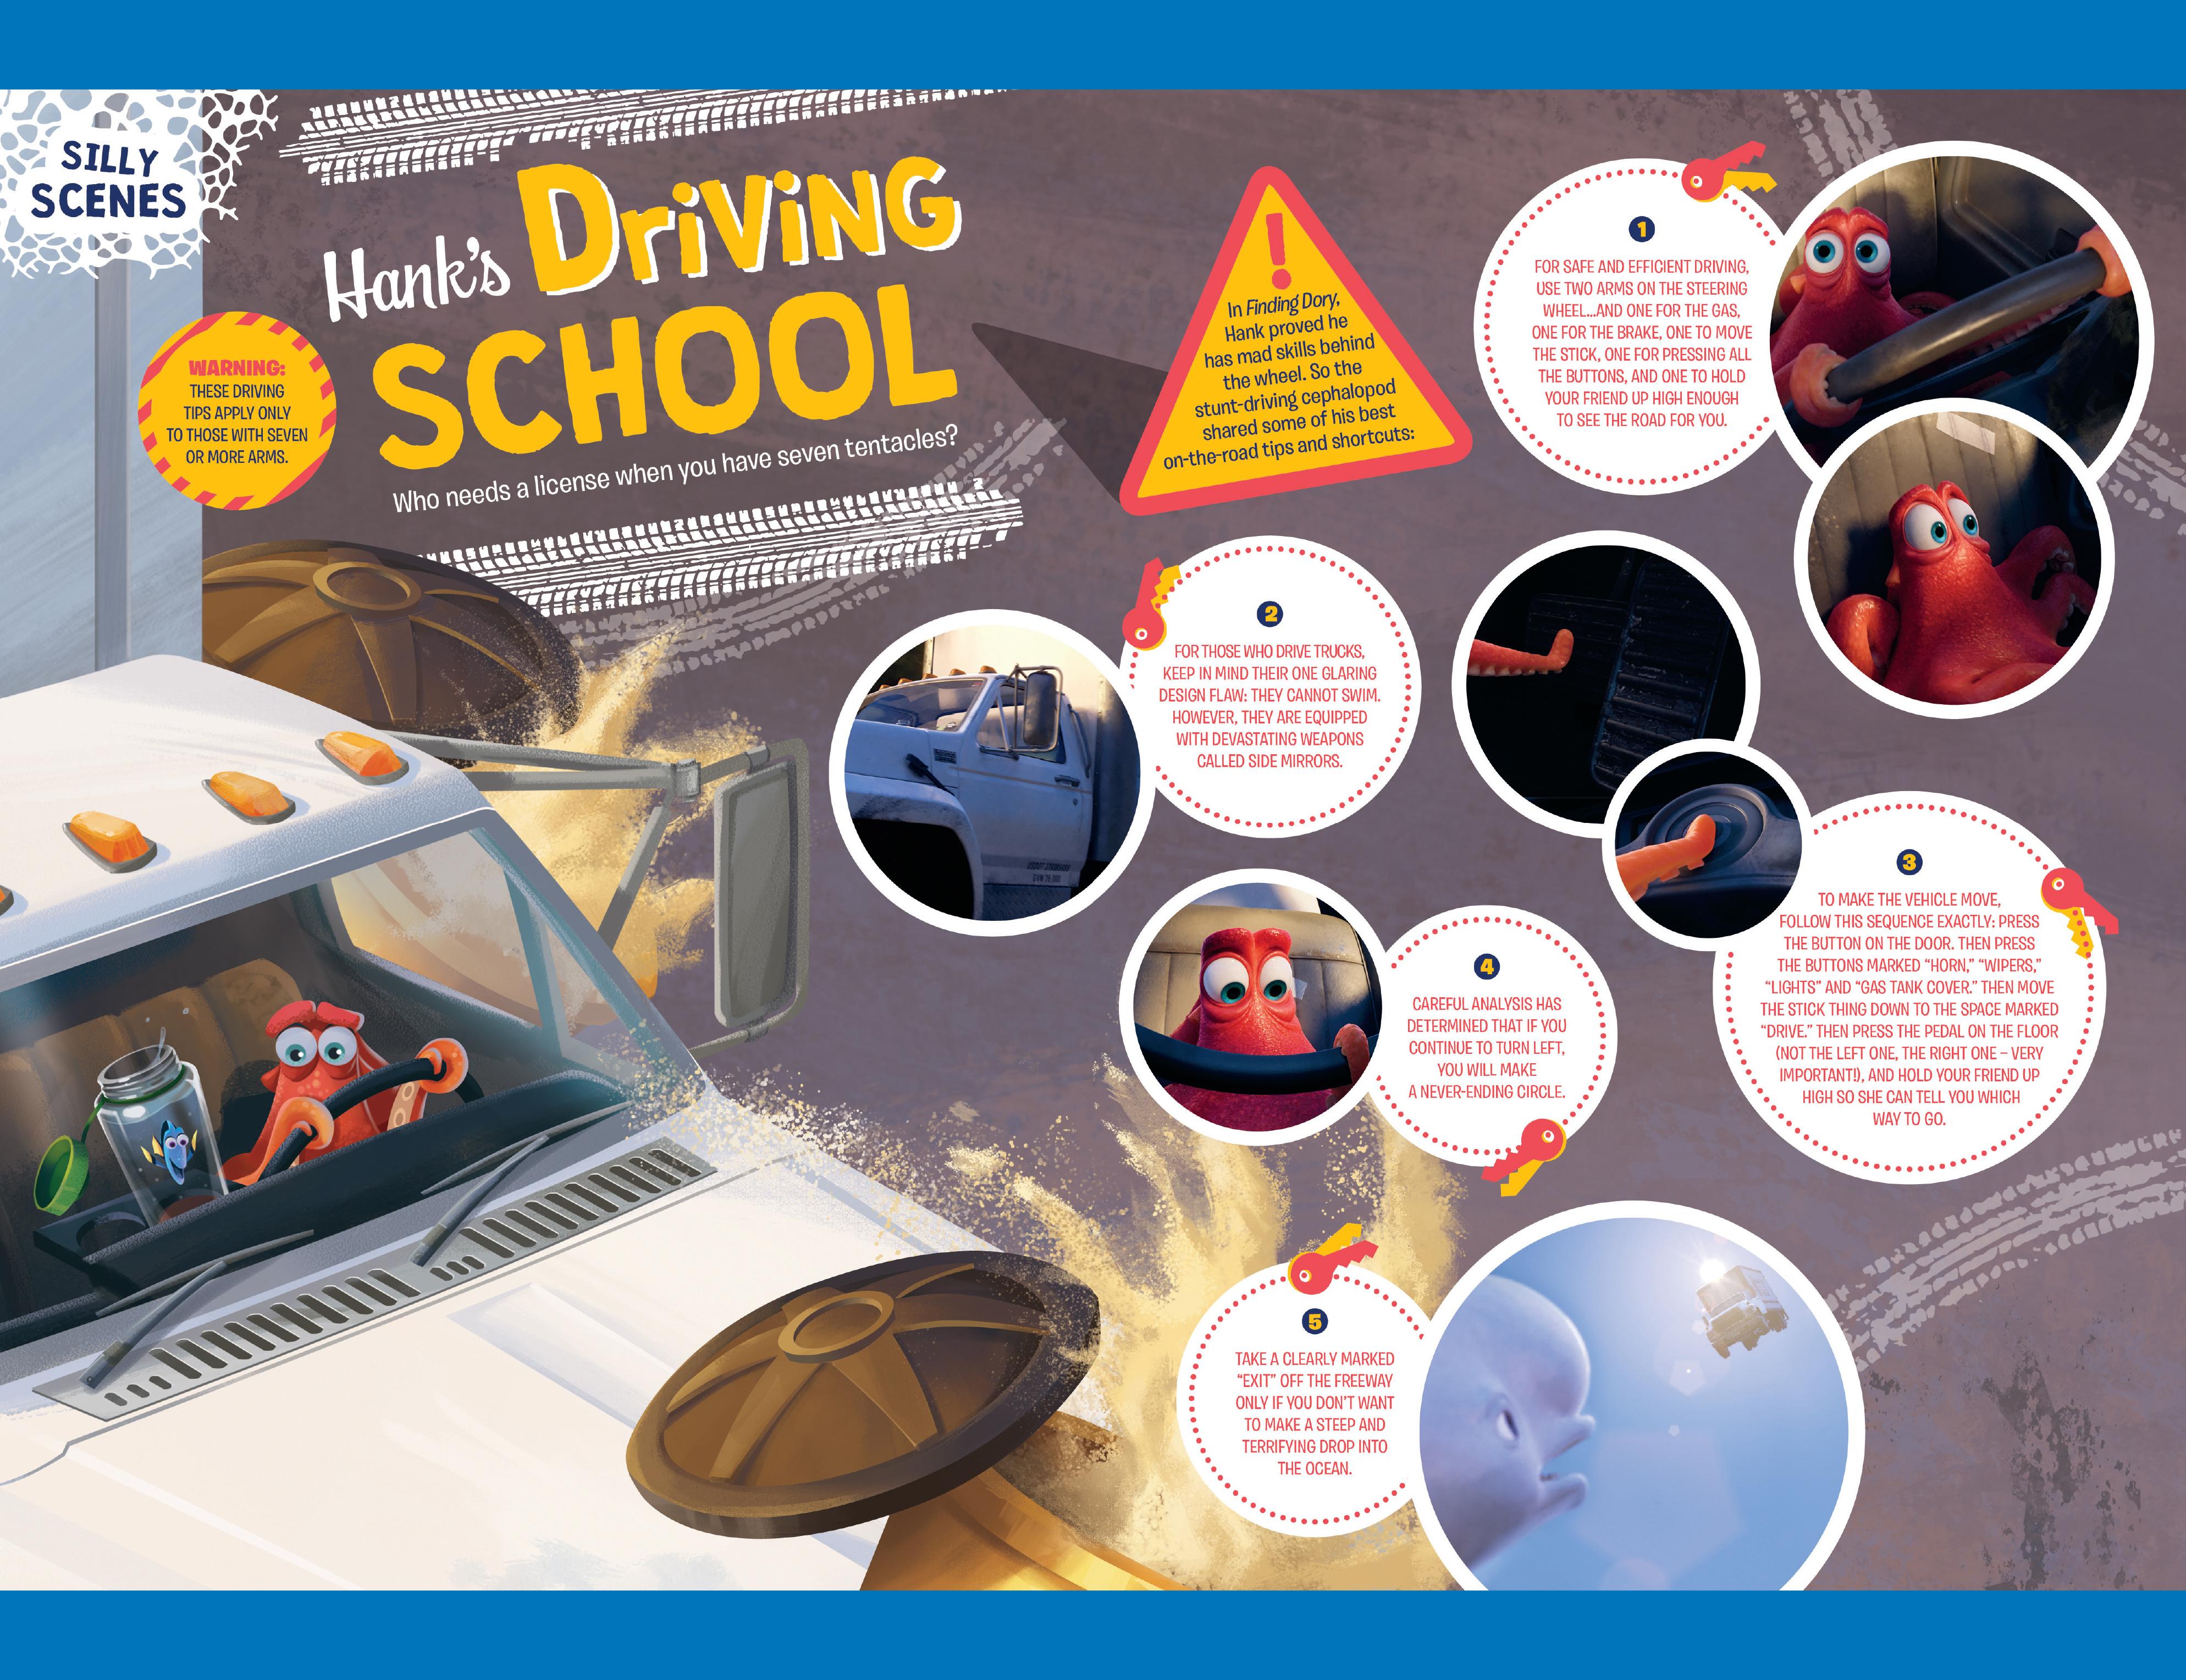 Read online Disney Pixar Finding Dory comic -  Issue #3 - 31